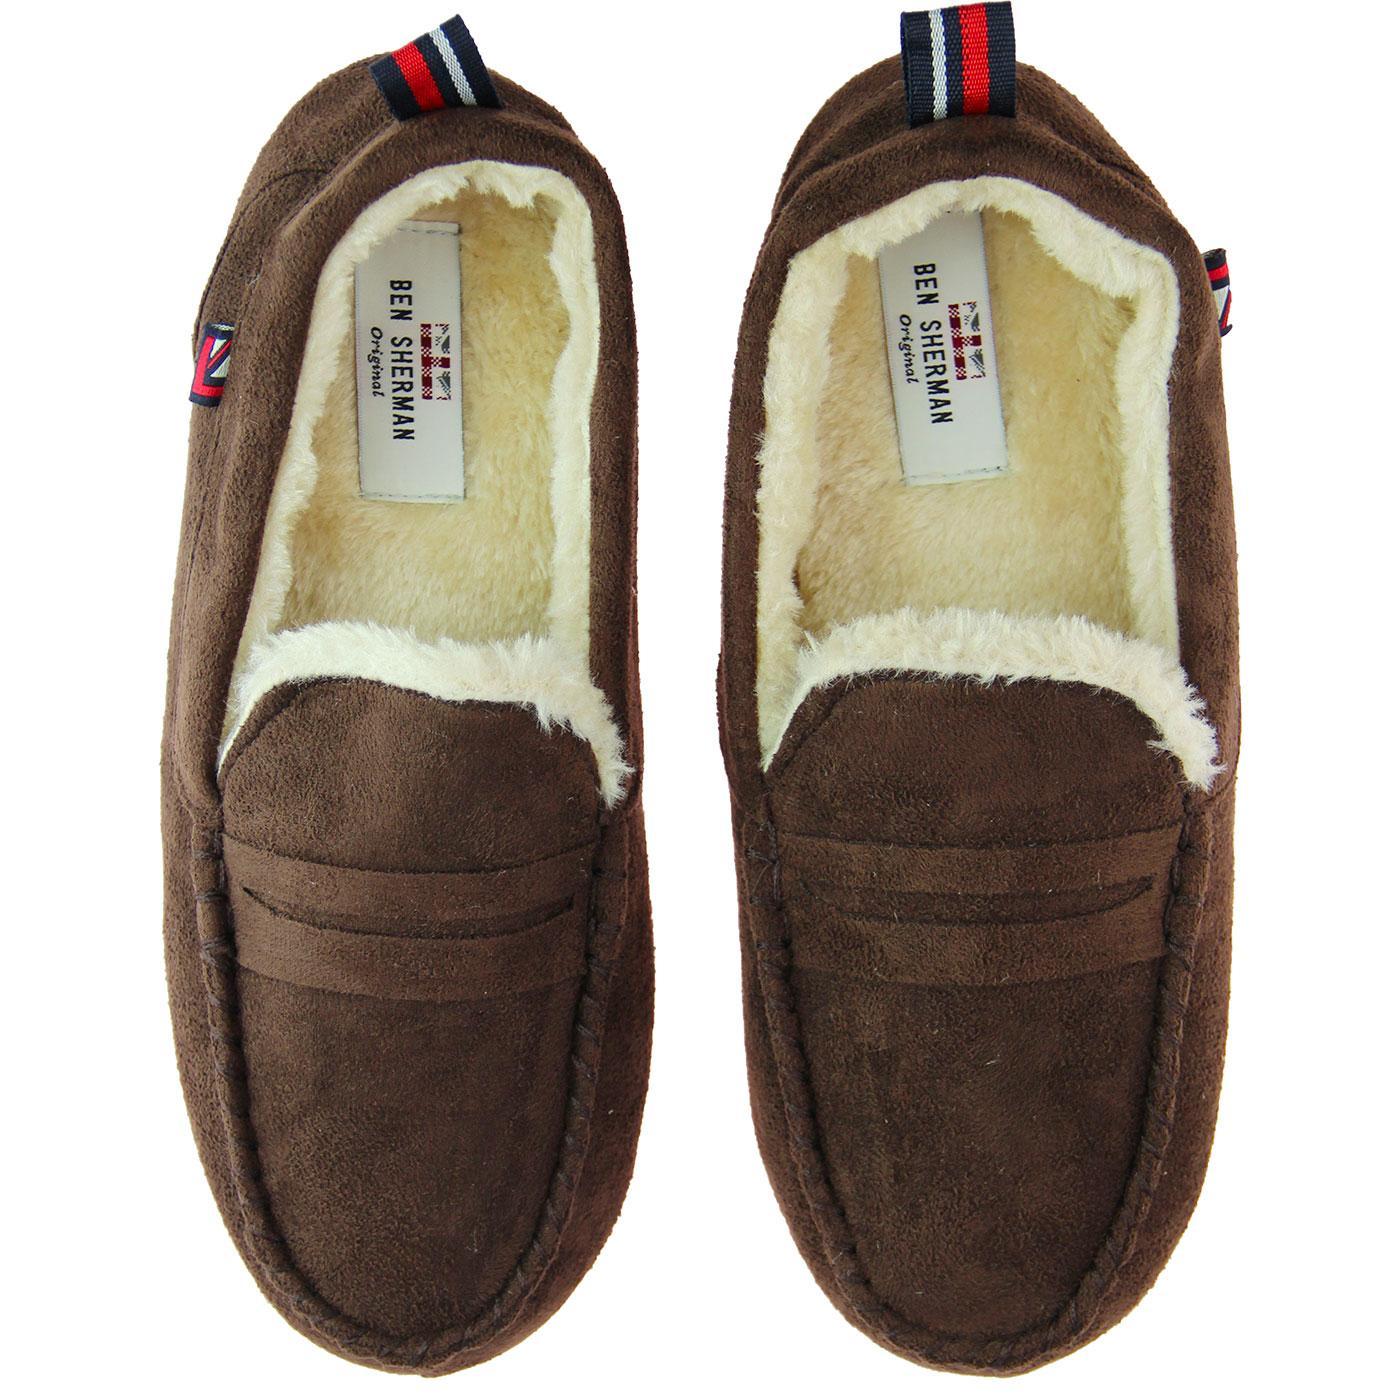 Four Seasons BEN SHERMAN Moccasin Slippers (Brown)